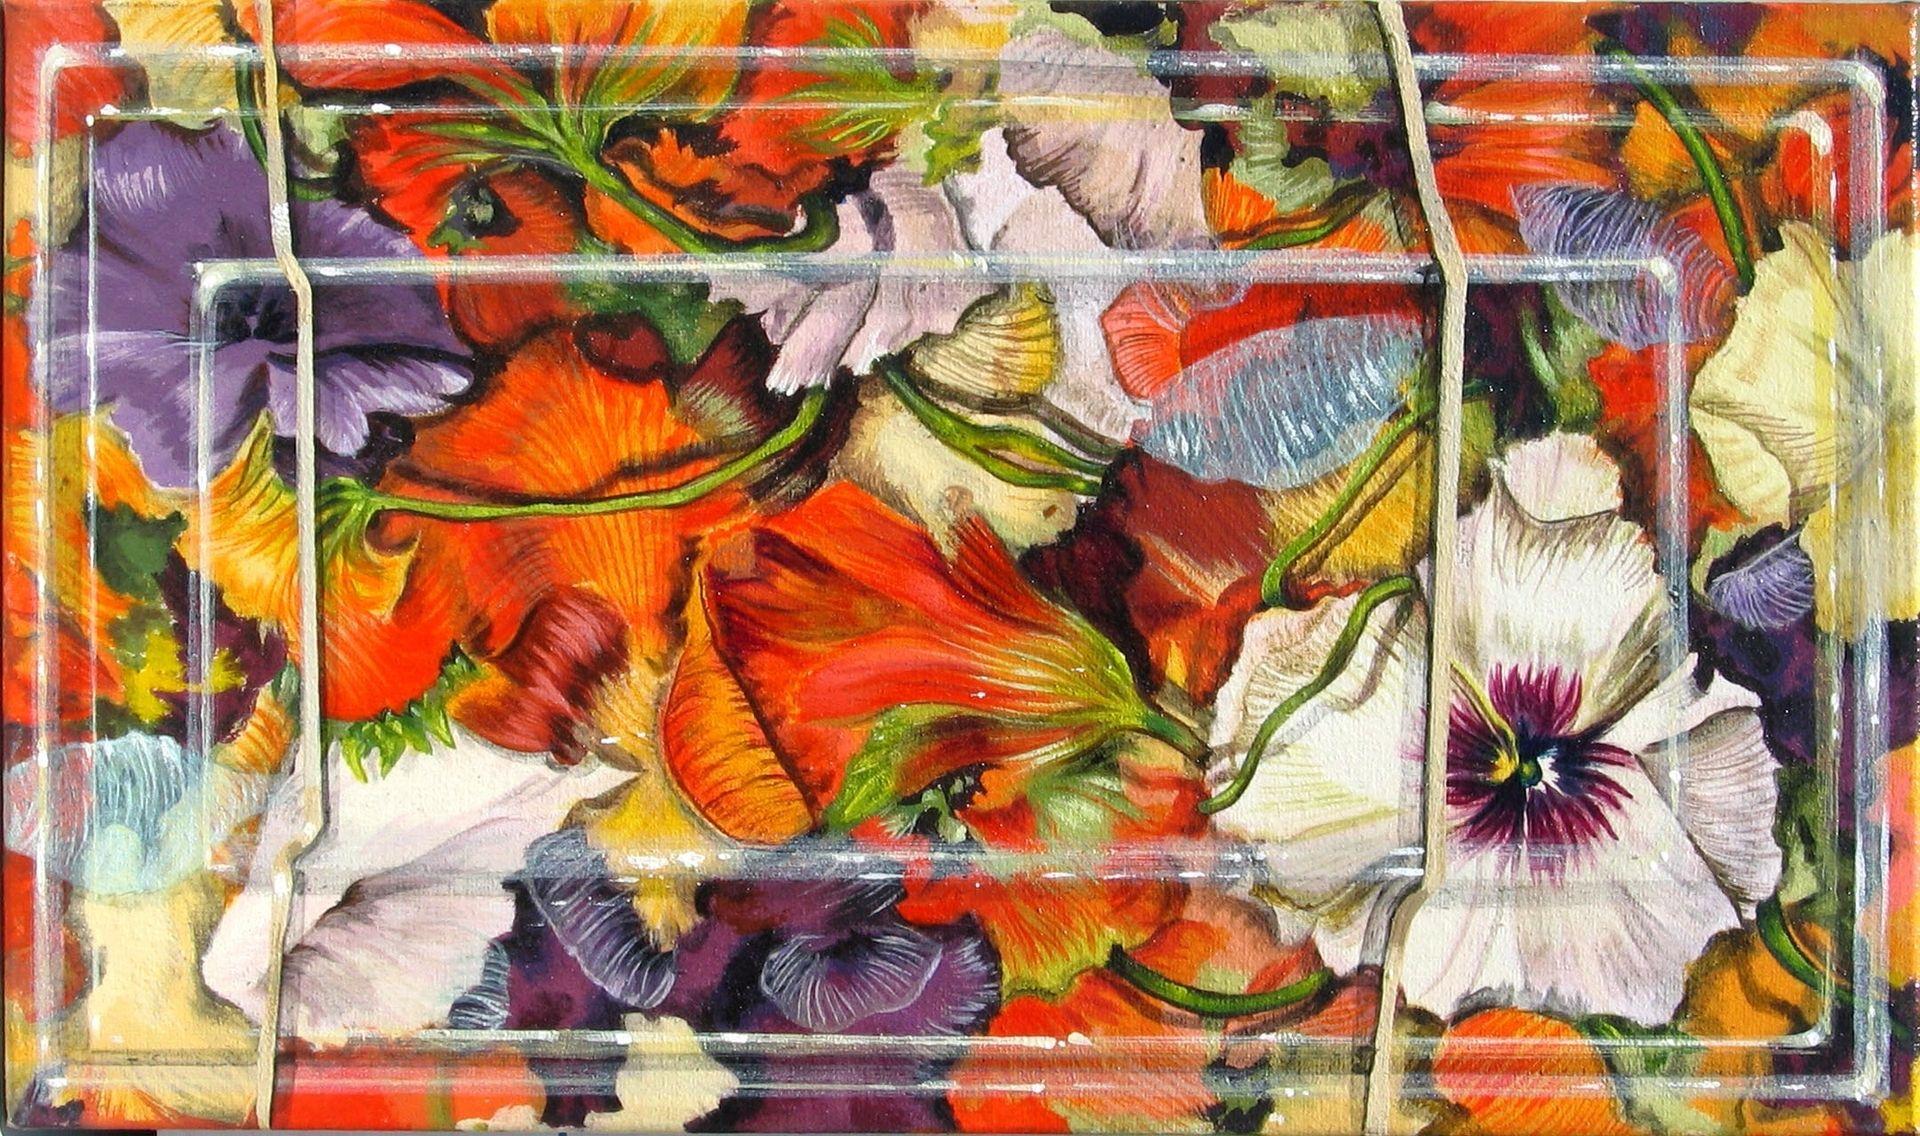 Custom Trompe L Oeil Painting Of Edible Salad Flowers With